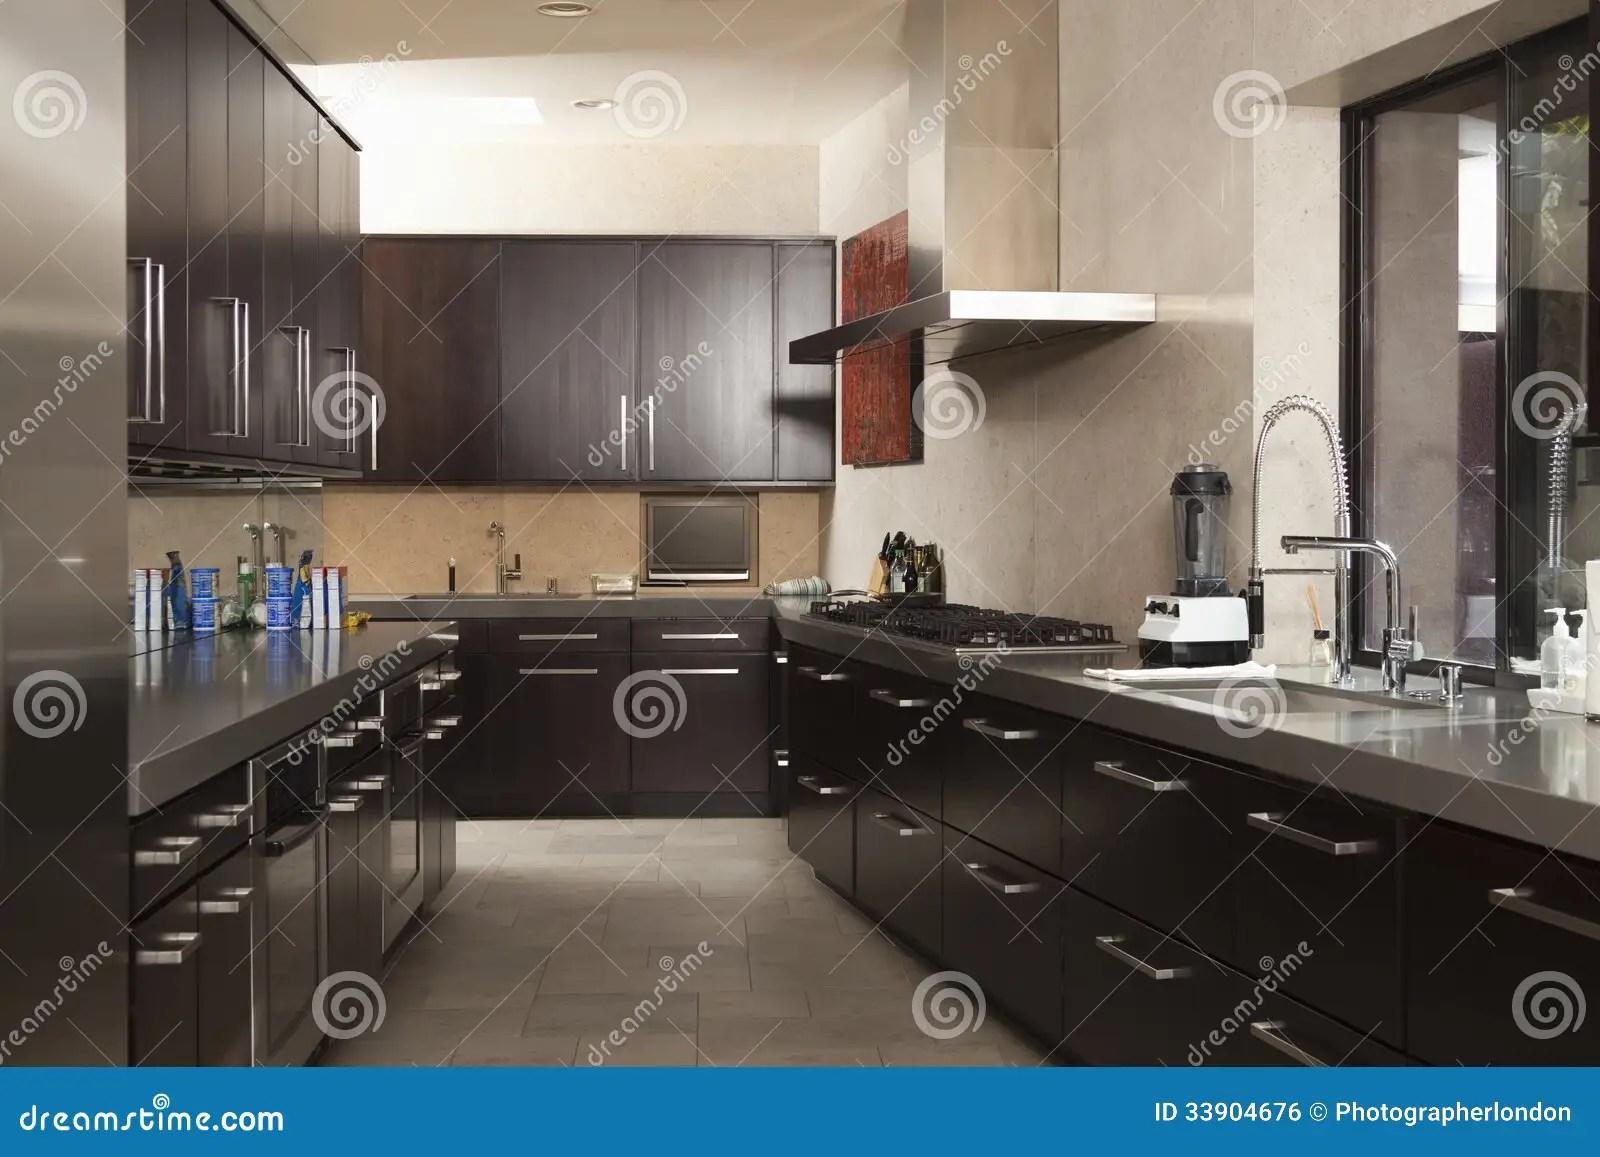 commercial kitchens kitchen rugs target 空的商业厨房库存照片 图片包括有春天 没人 掌上型计算机 水平 空的商业厨房